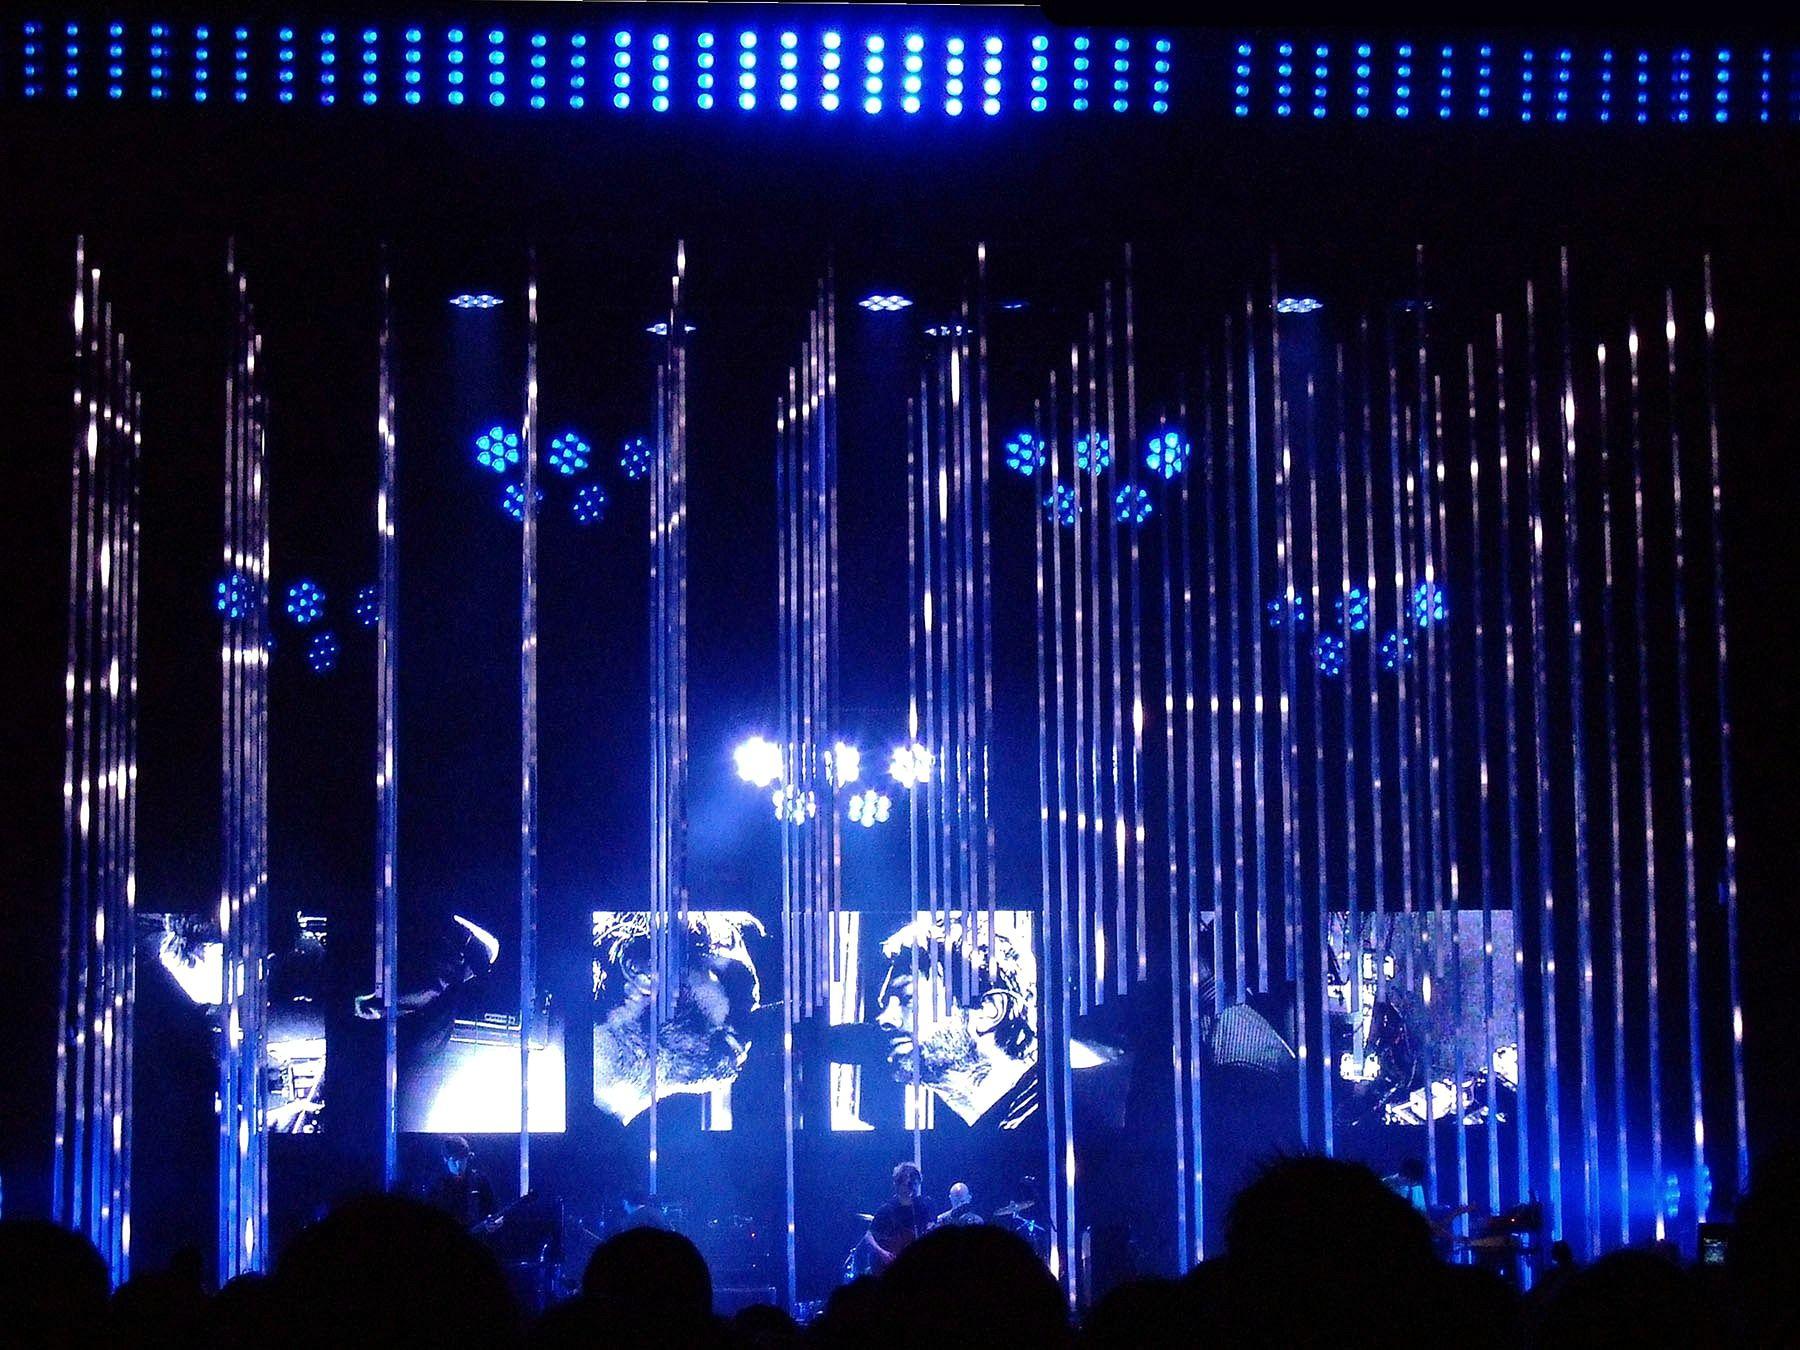 Radiohead In Rainbows Tour Stage